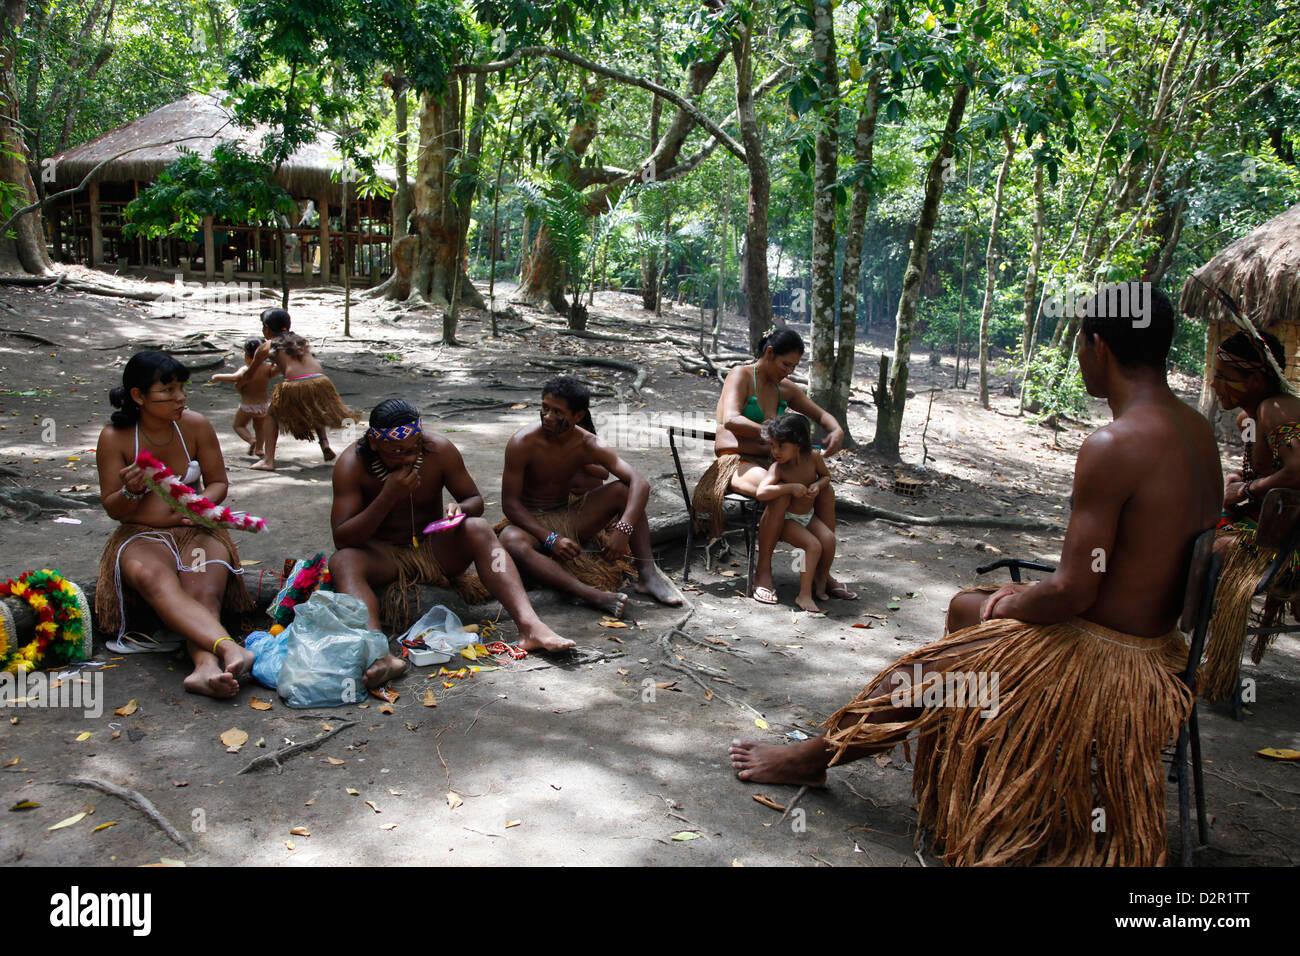 Pataxo Indian people at the Reserva Indigena da Jaqueira near Porto Seguro, Bahia, Brazil, South America - Stock Image